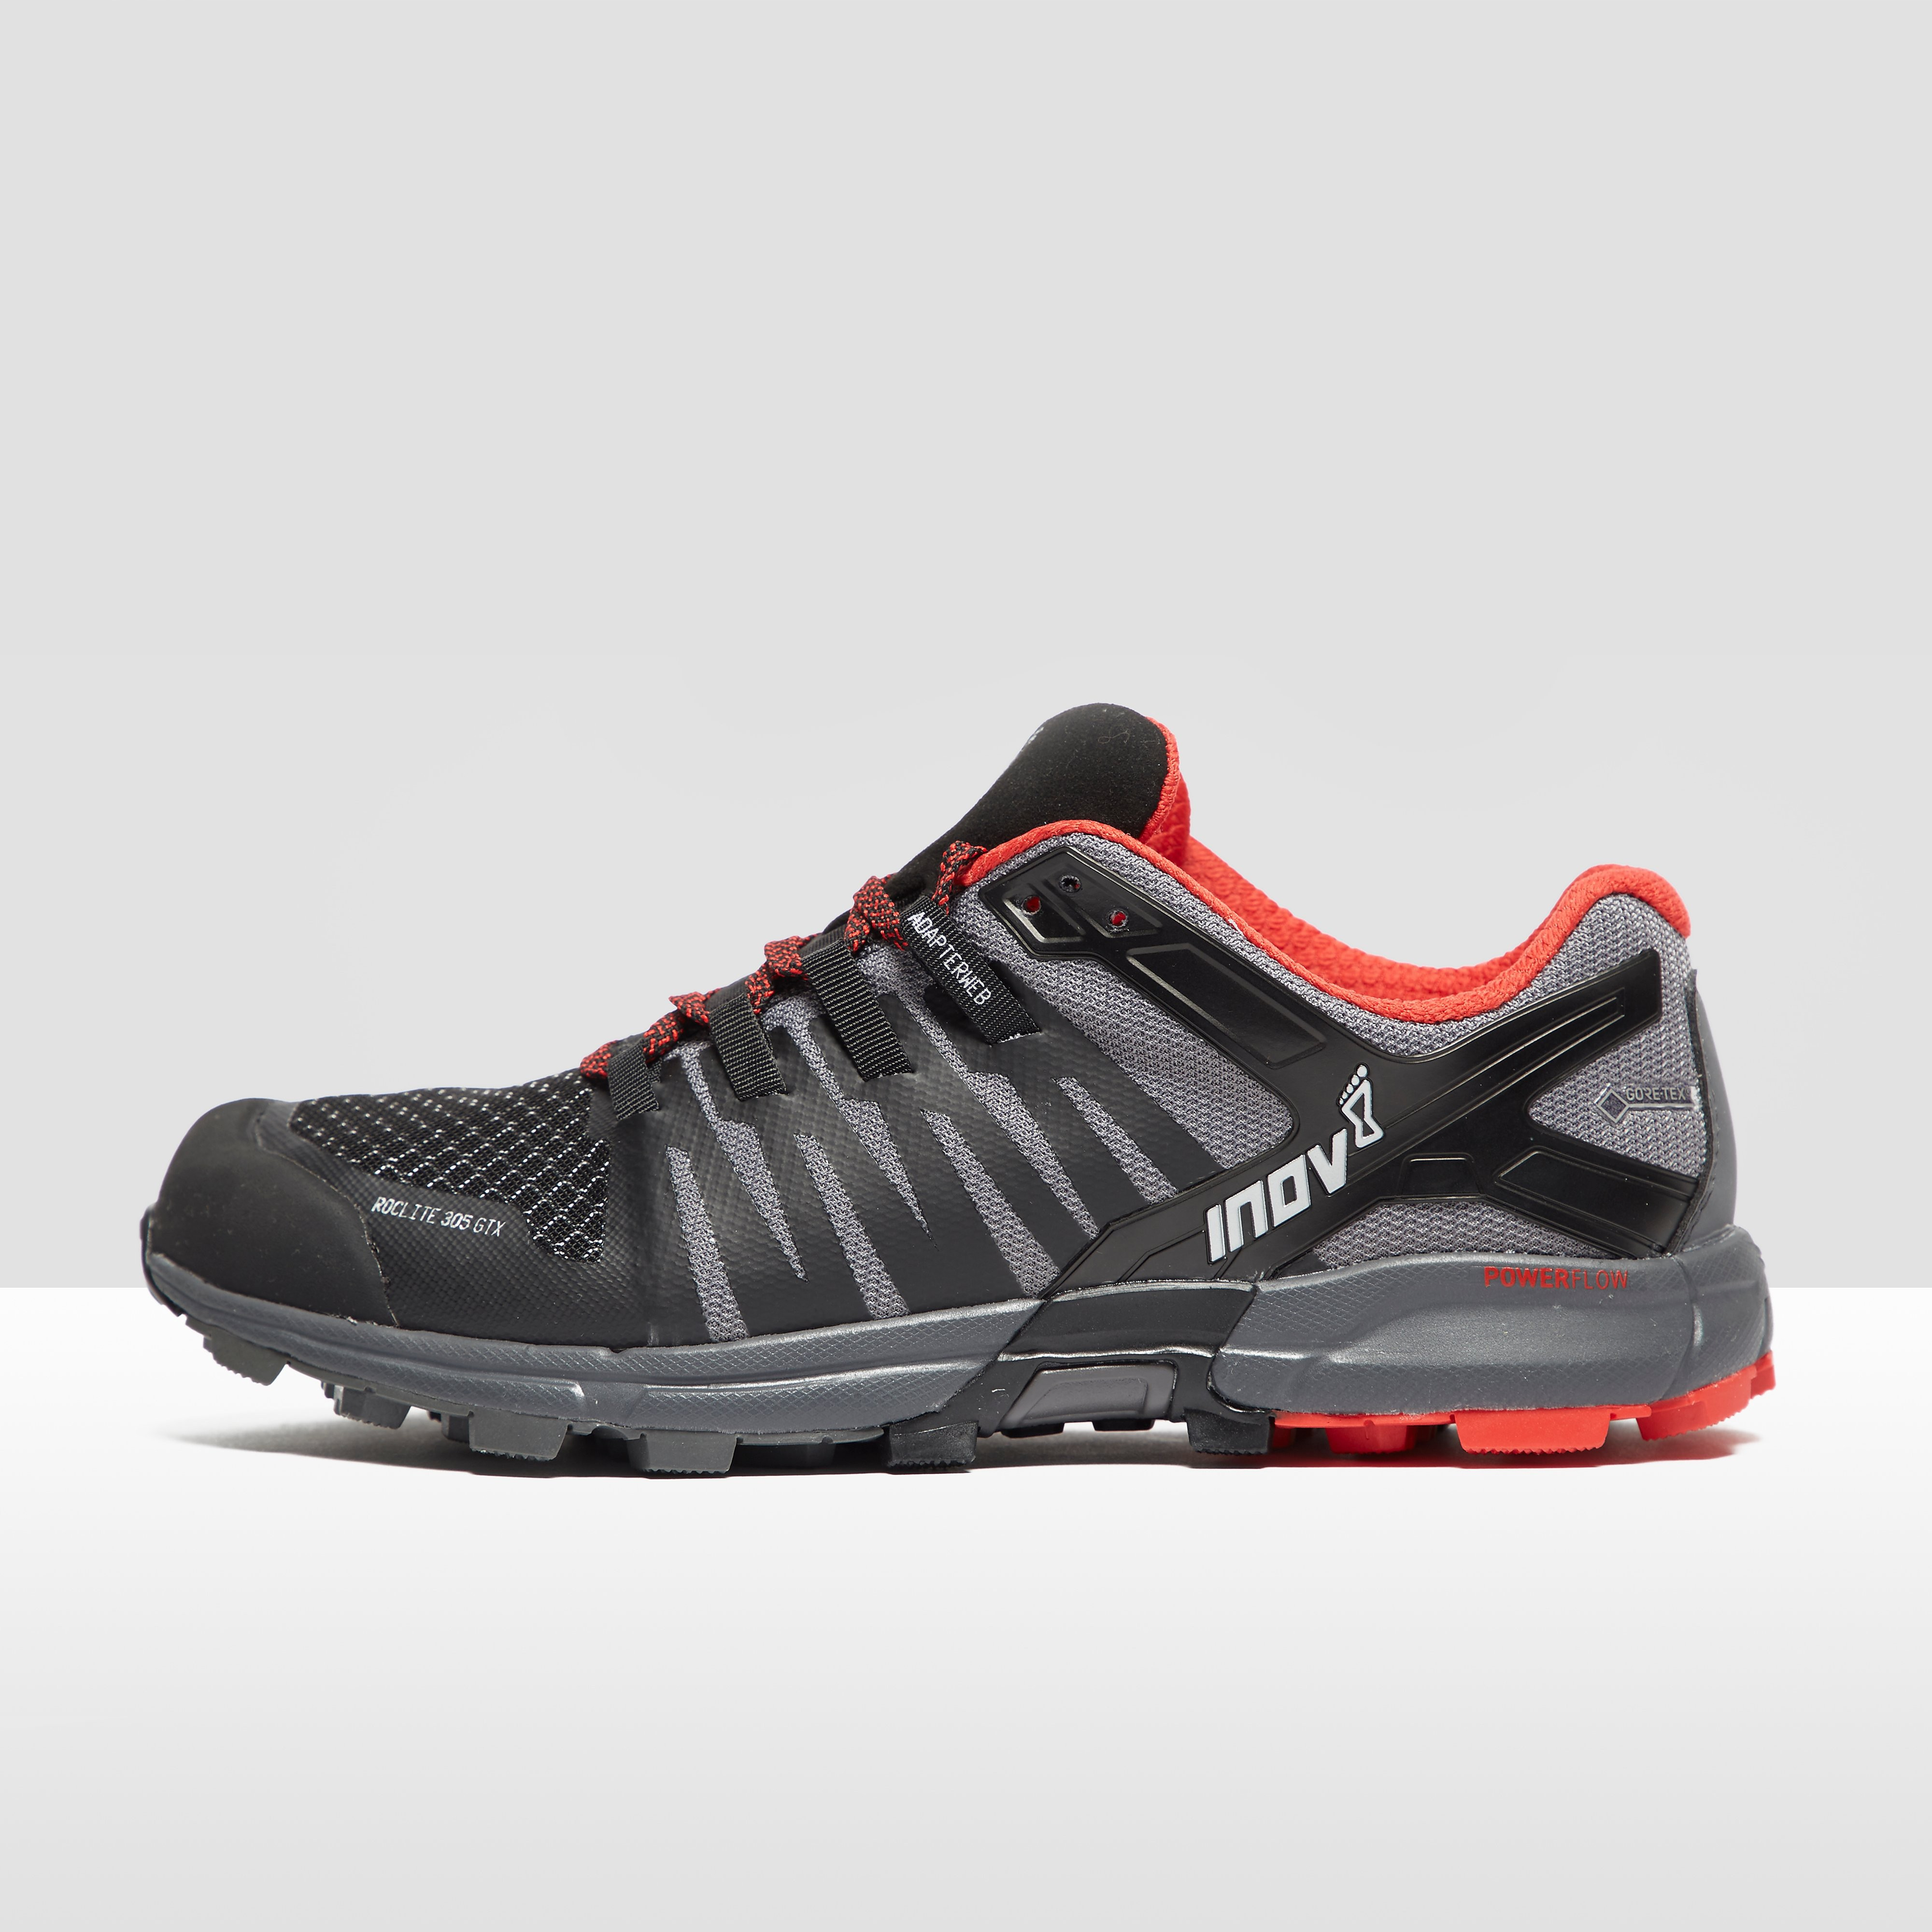 Inov-8 ROCLITE 305 GTX Men's Trail Running Shoes